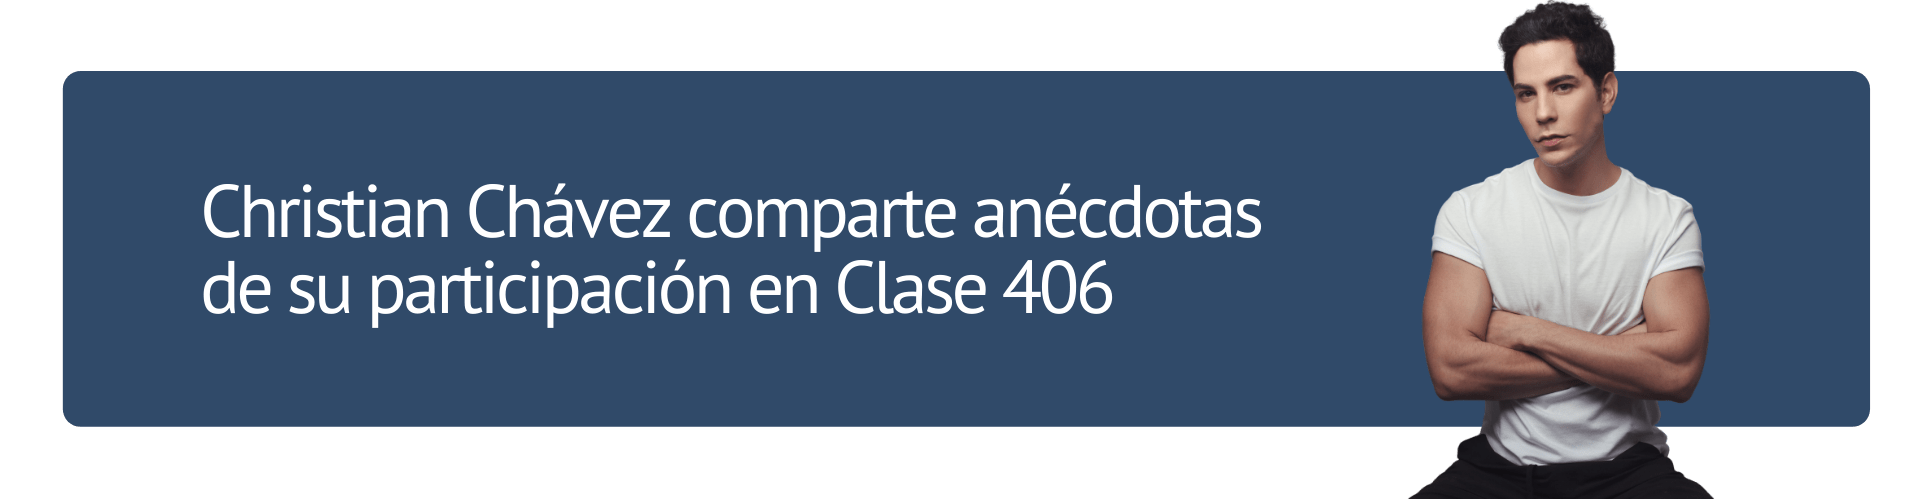 https://i2.wp.com/unetealatribu.tv/wp-content/uploads/2020/09/Christian-Chávez-clase-406.png?fit=1920%2C500&ssl=1